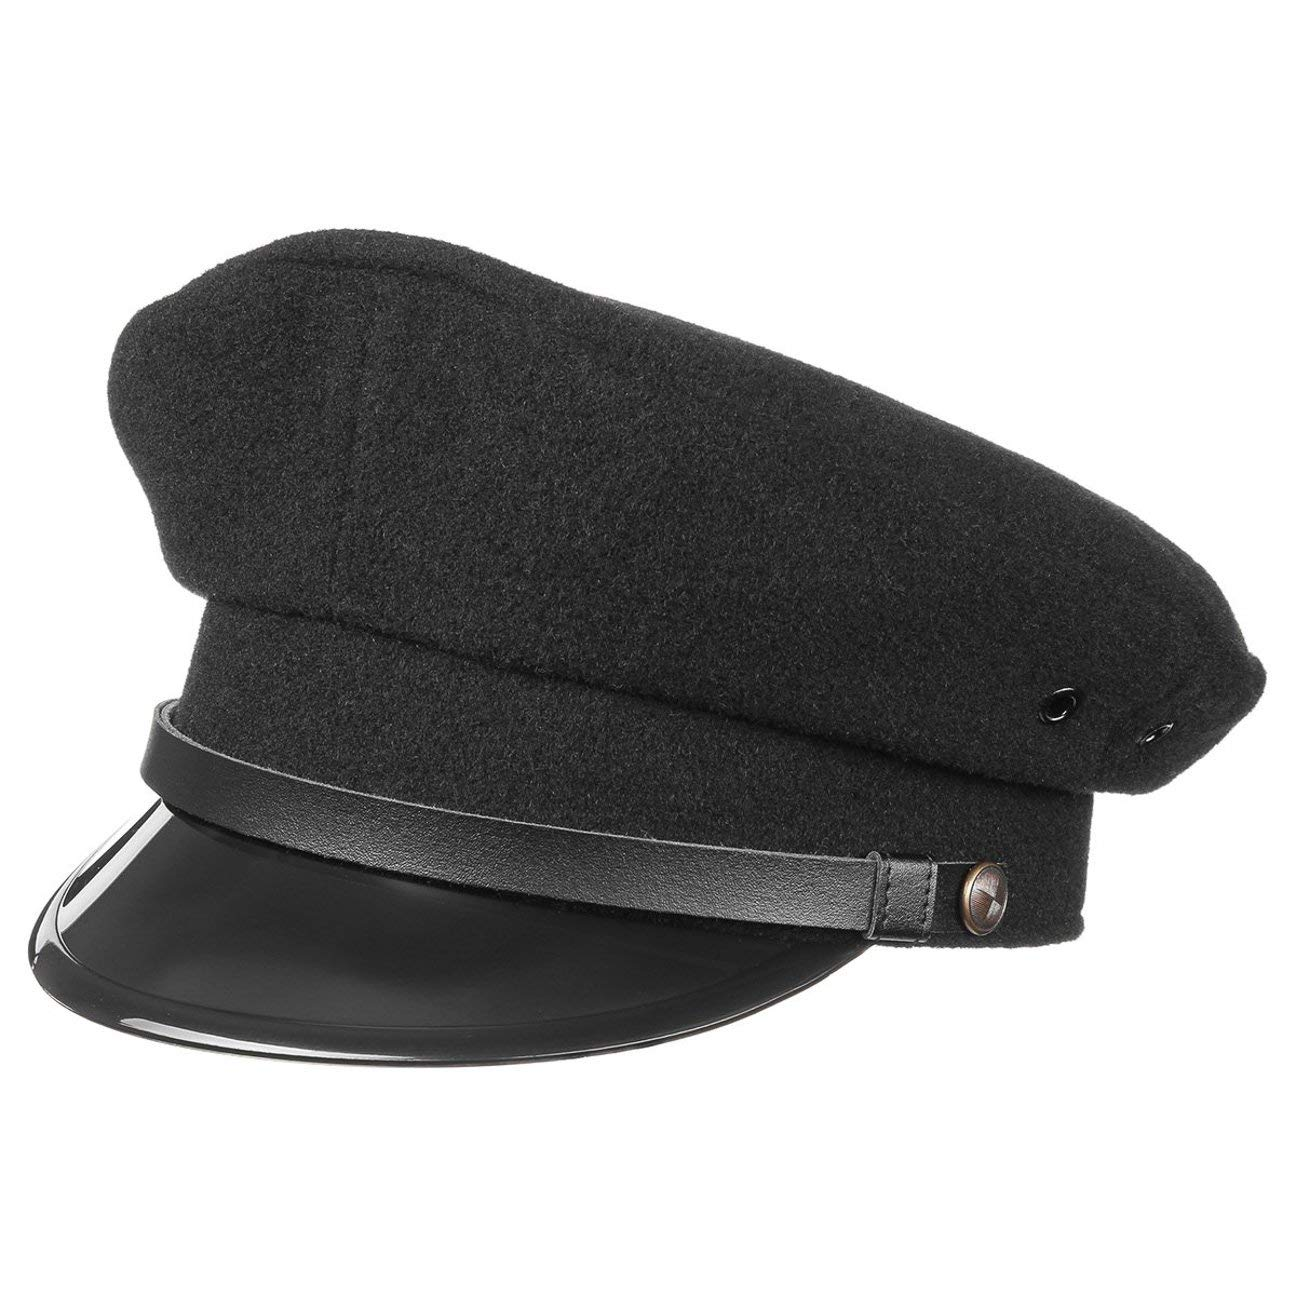 Lierys Train Driver Hat Men Made in The EU